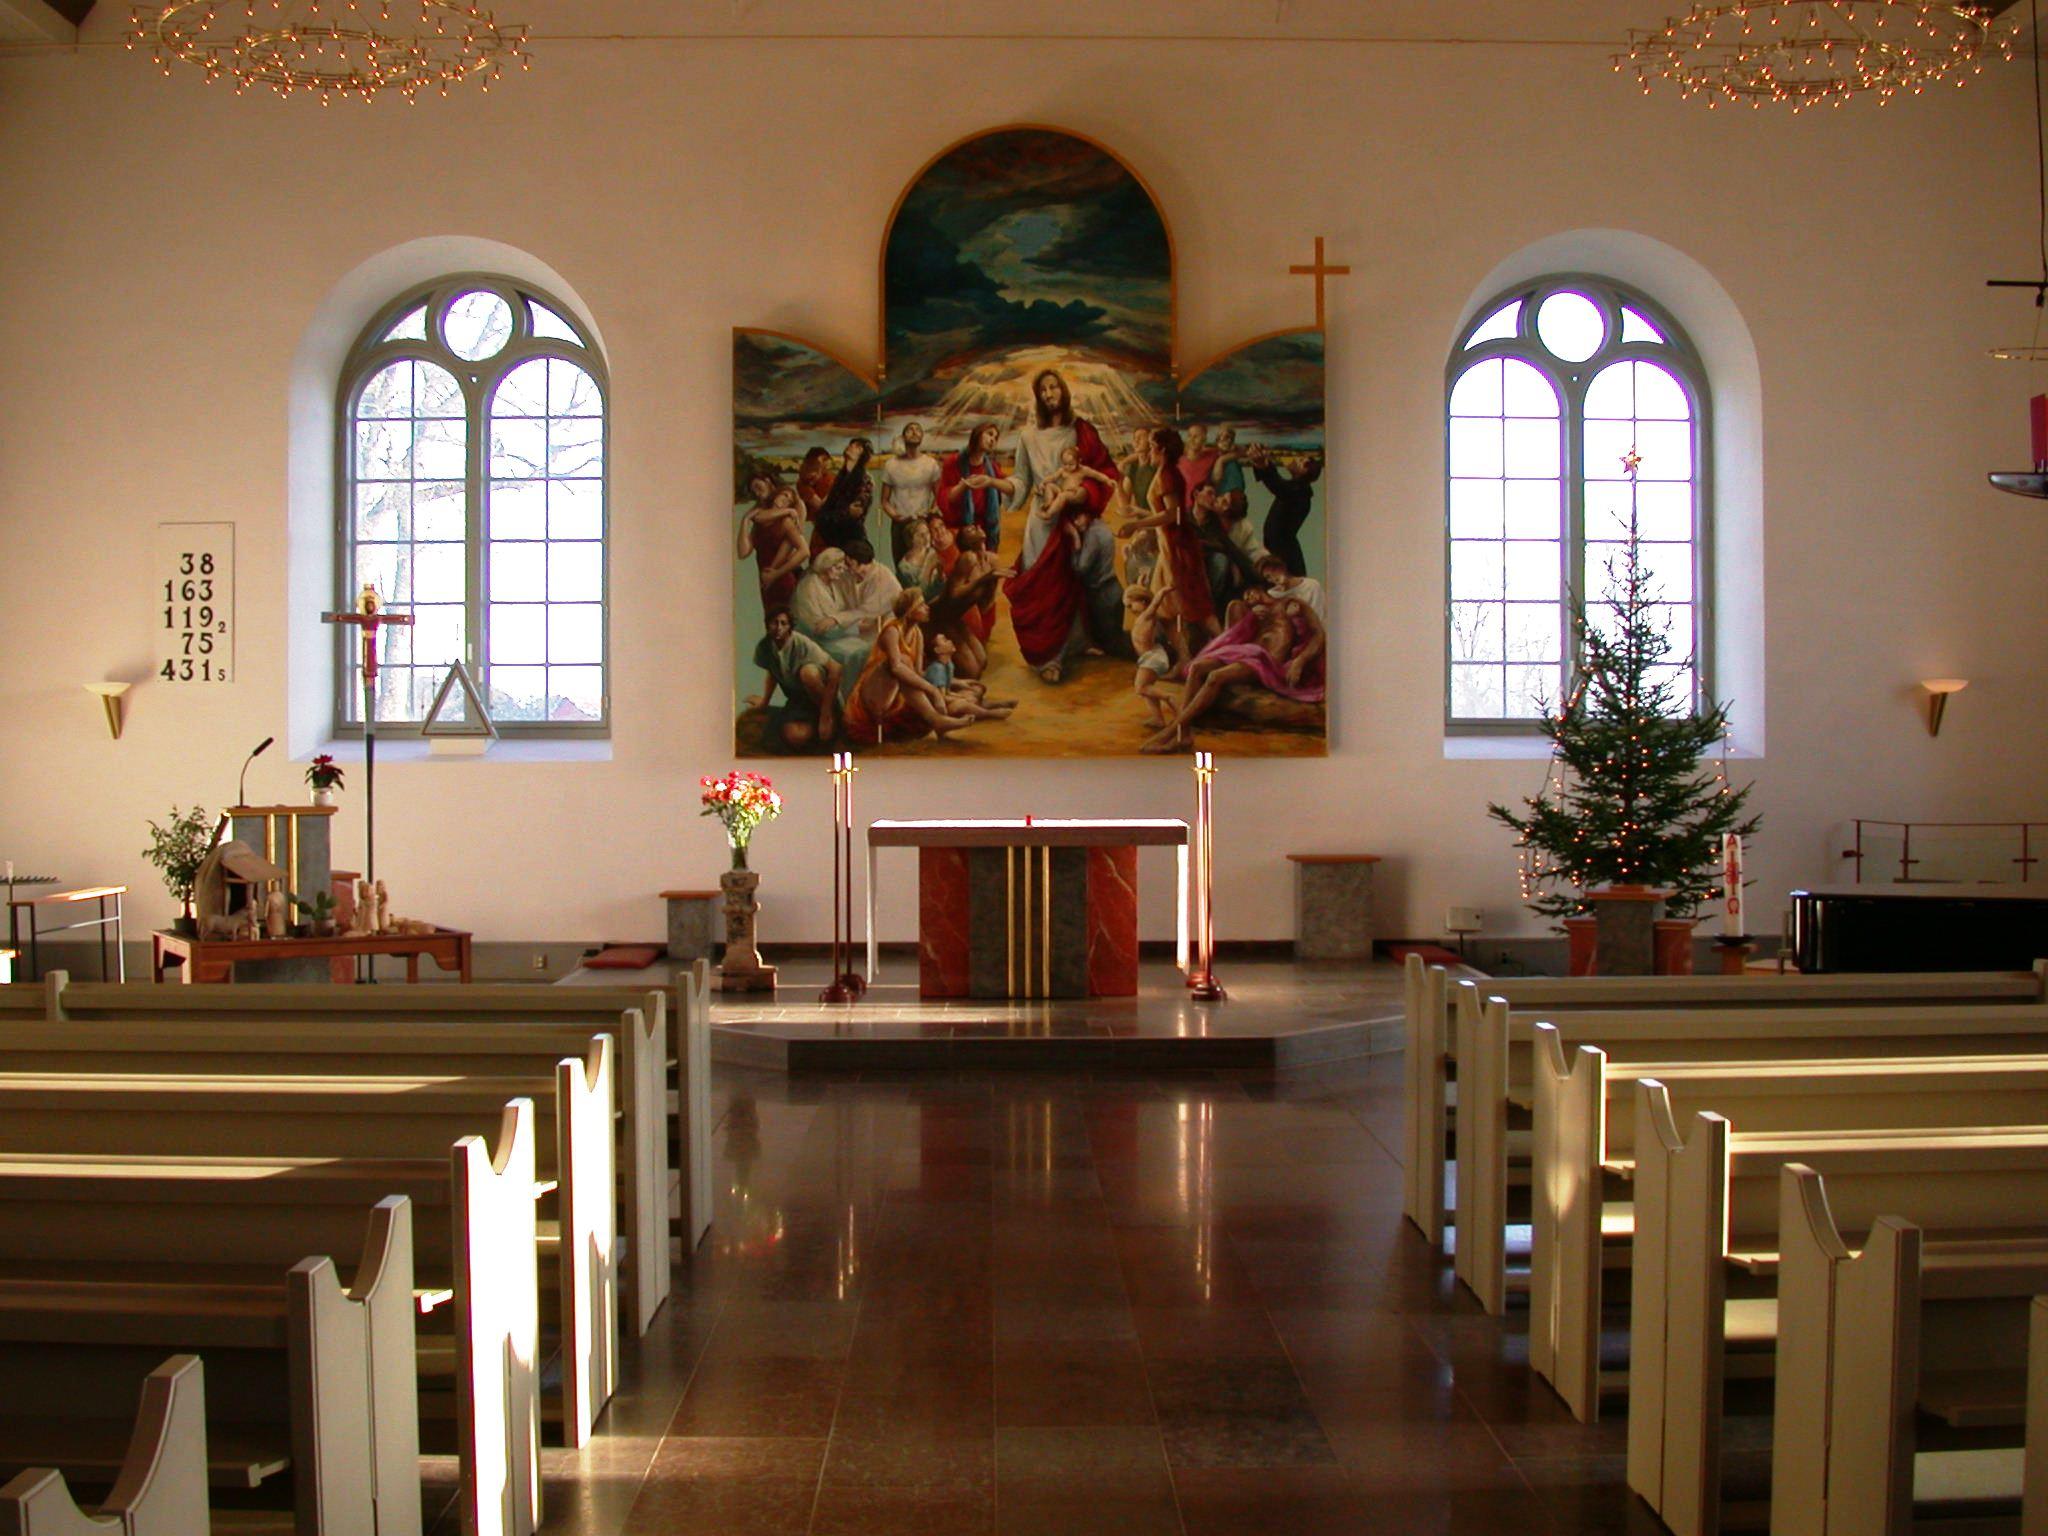 Fil:Ryssby church Kalmar Sweden omr-scanner.net Wikipedia